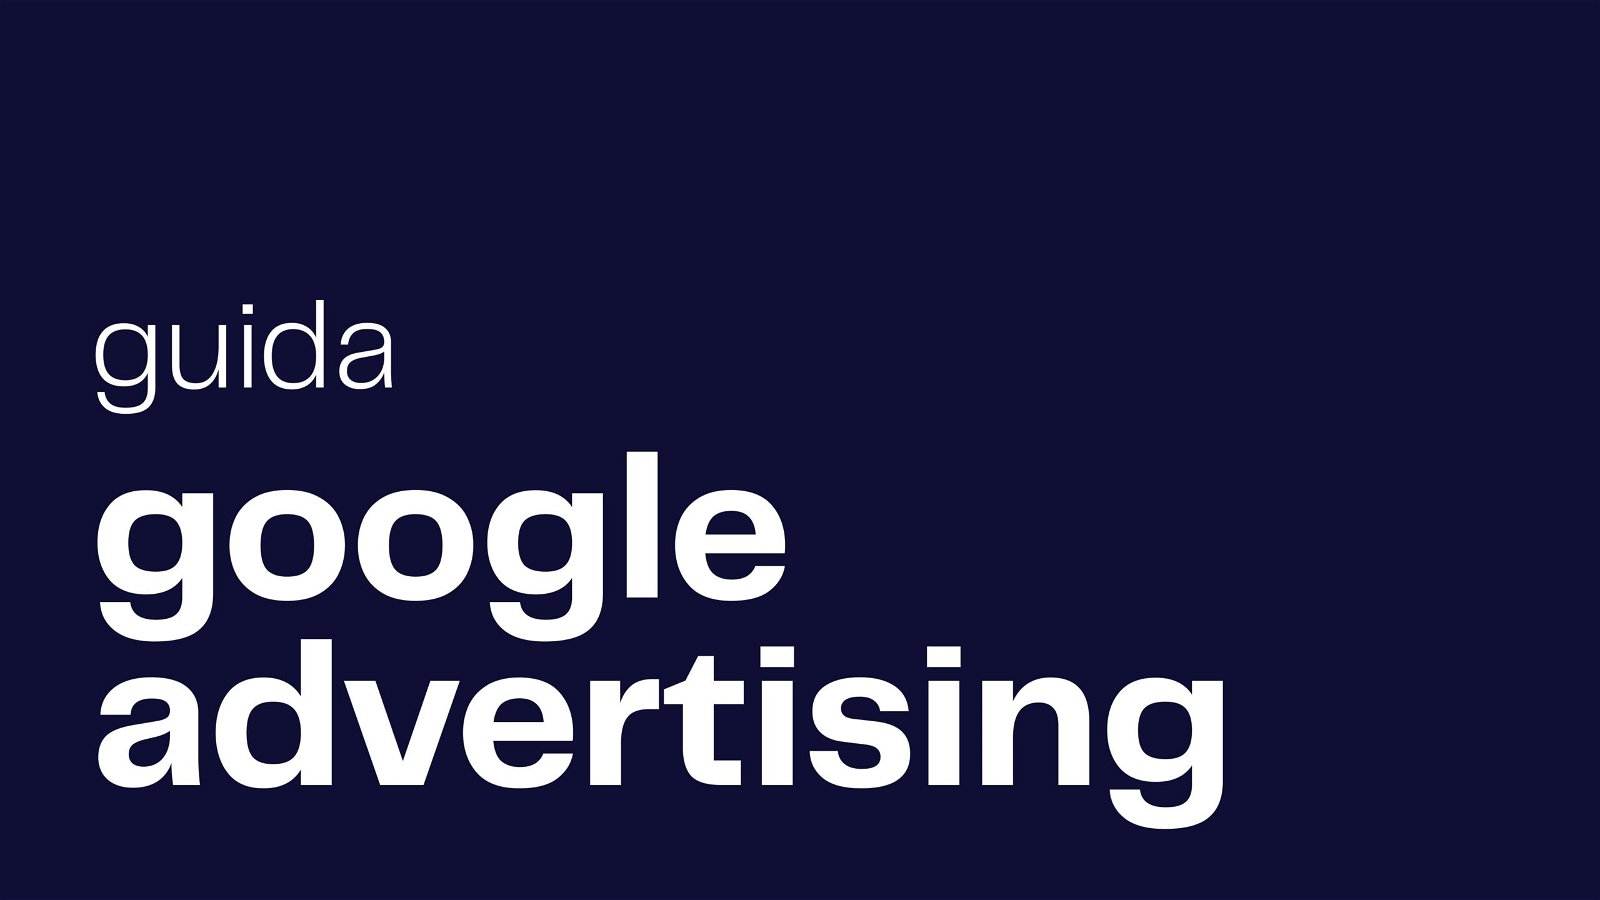 guida google advertising